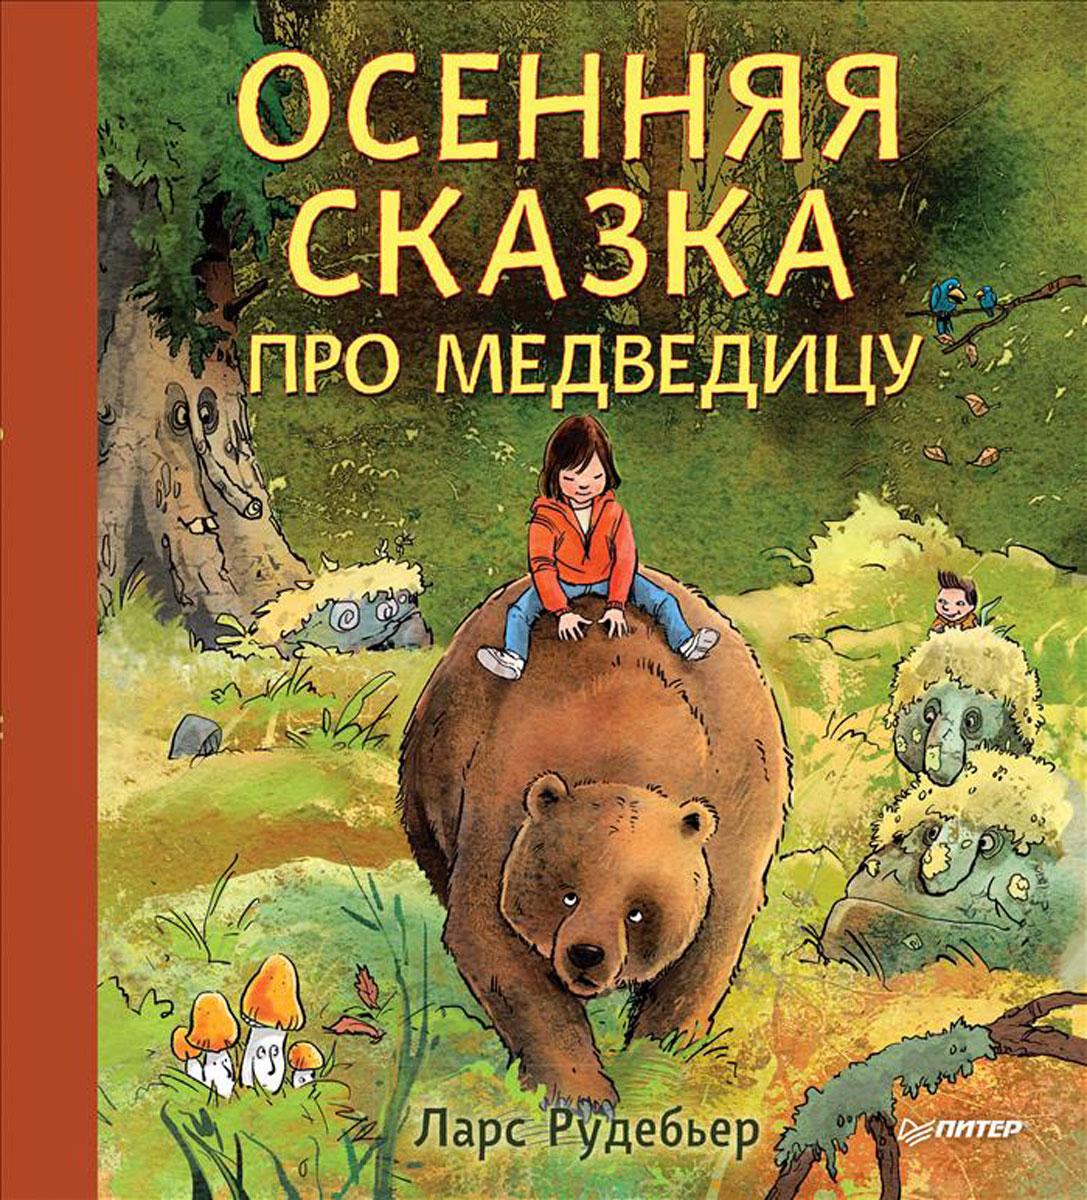 Ларс Рудебьер Осенняя сказка про Медведицу ид питер осенняя сказка про медведицу